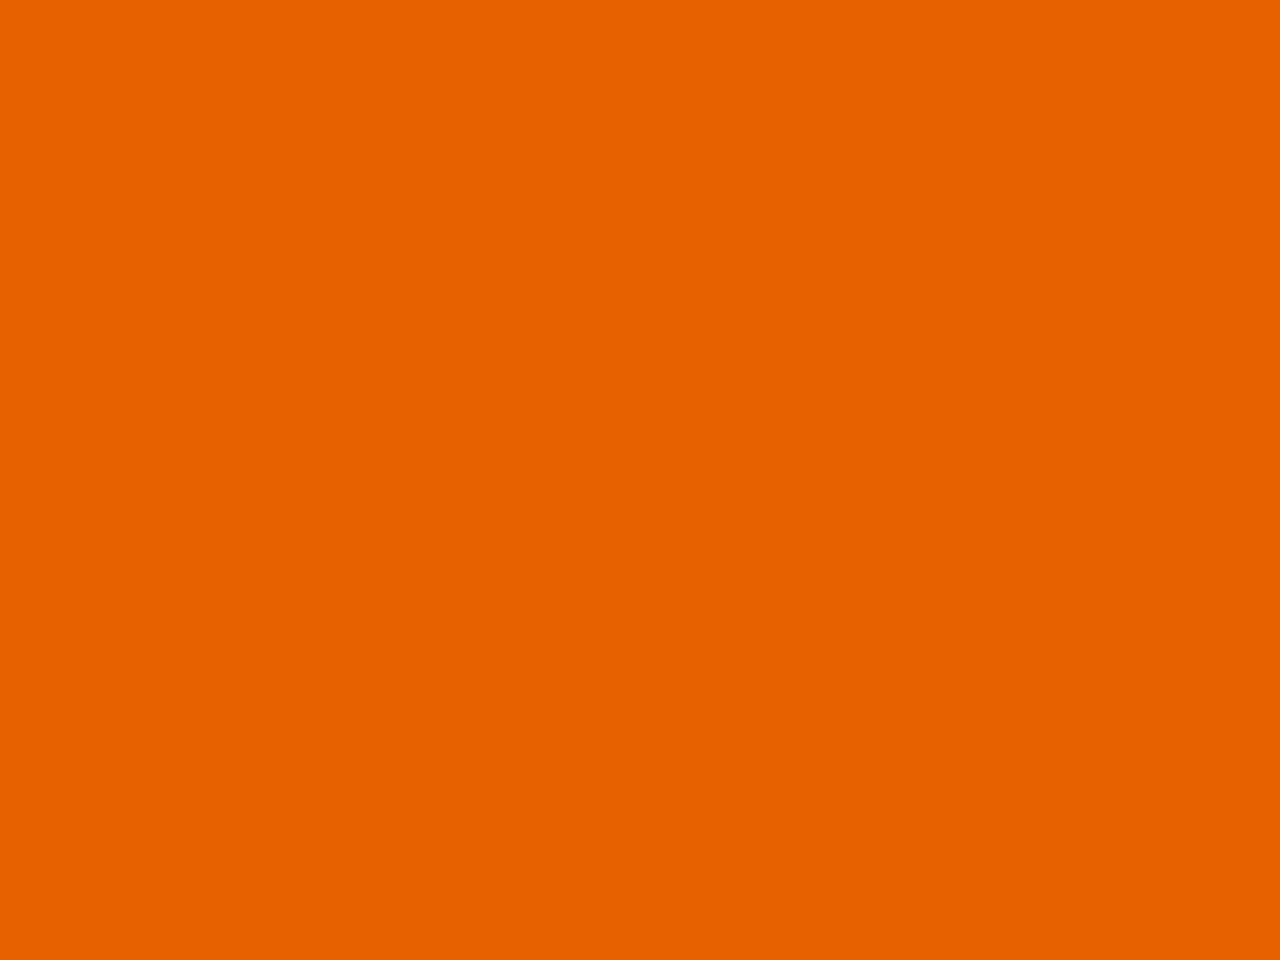 1280x960 Spanish Orange Solid Color Background